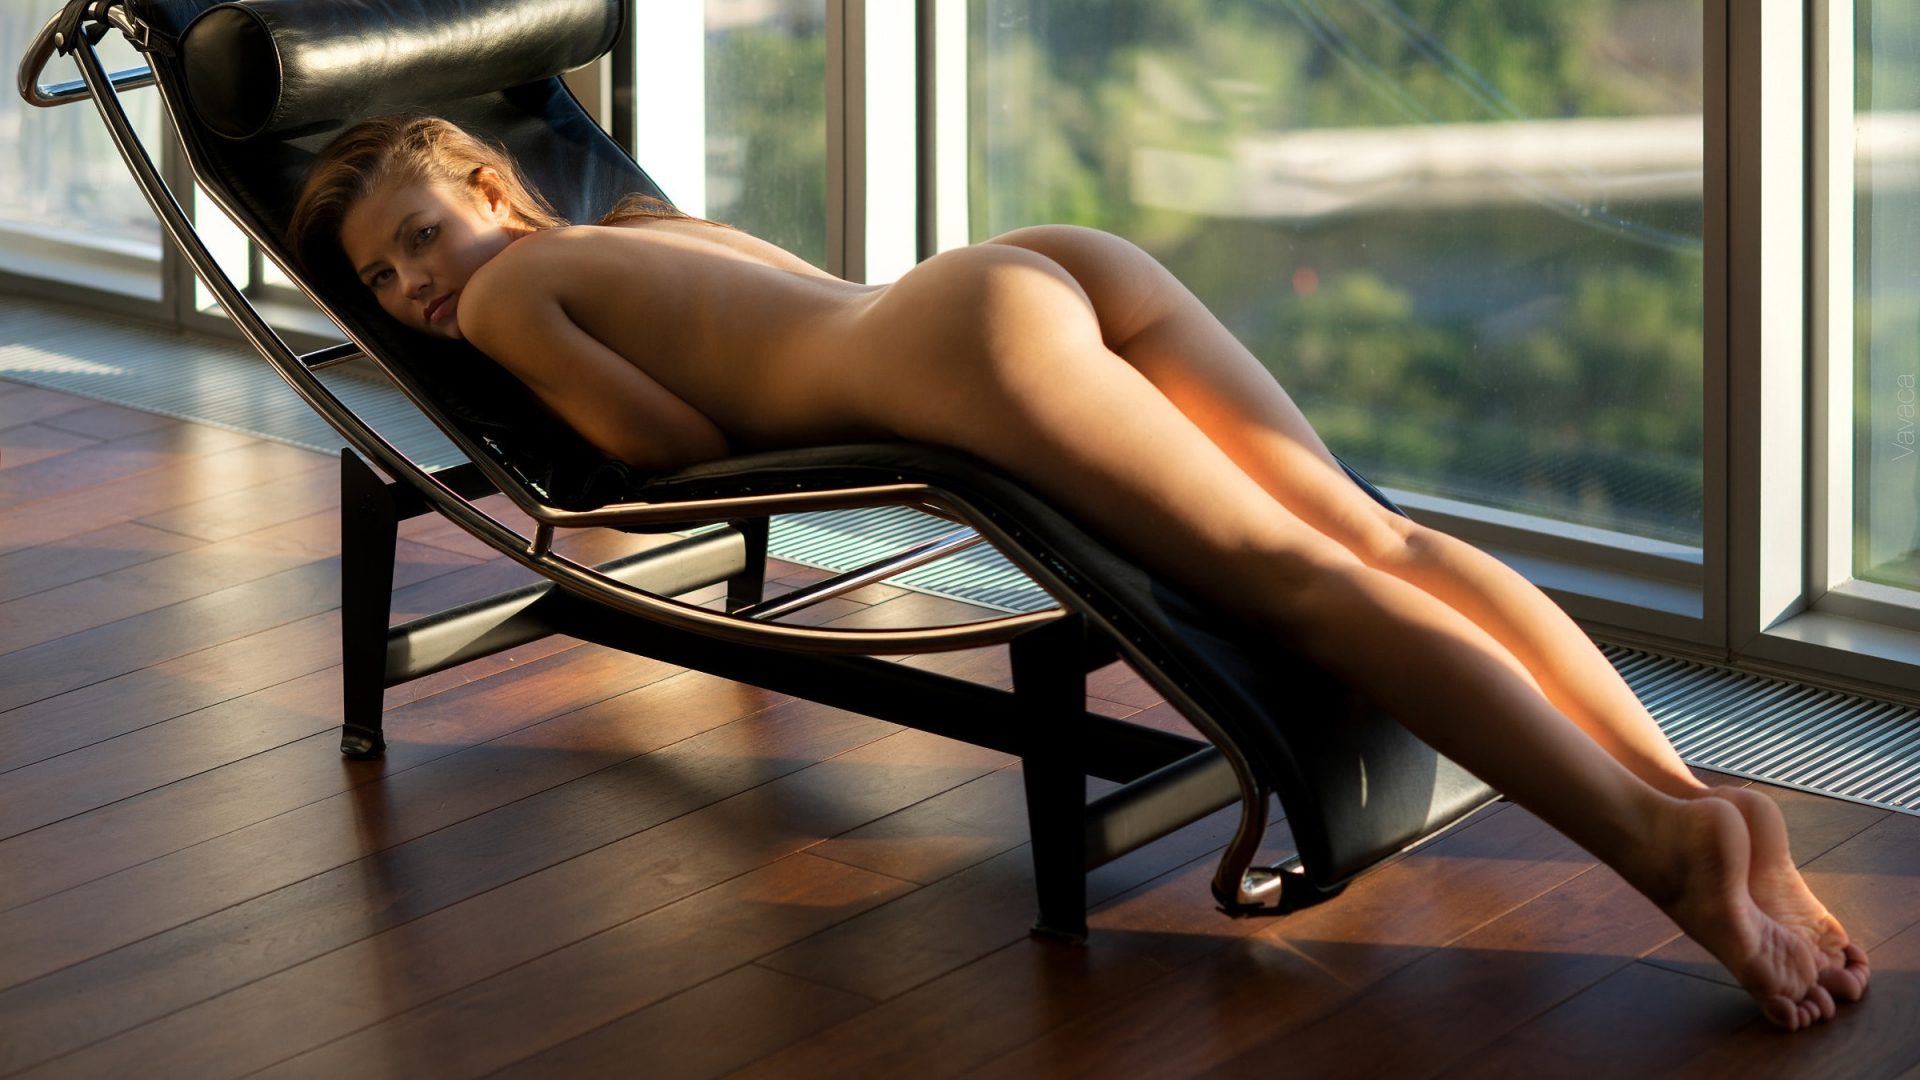 Victoria nestorowicz nude